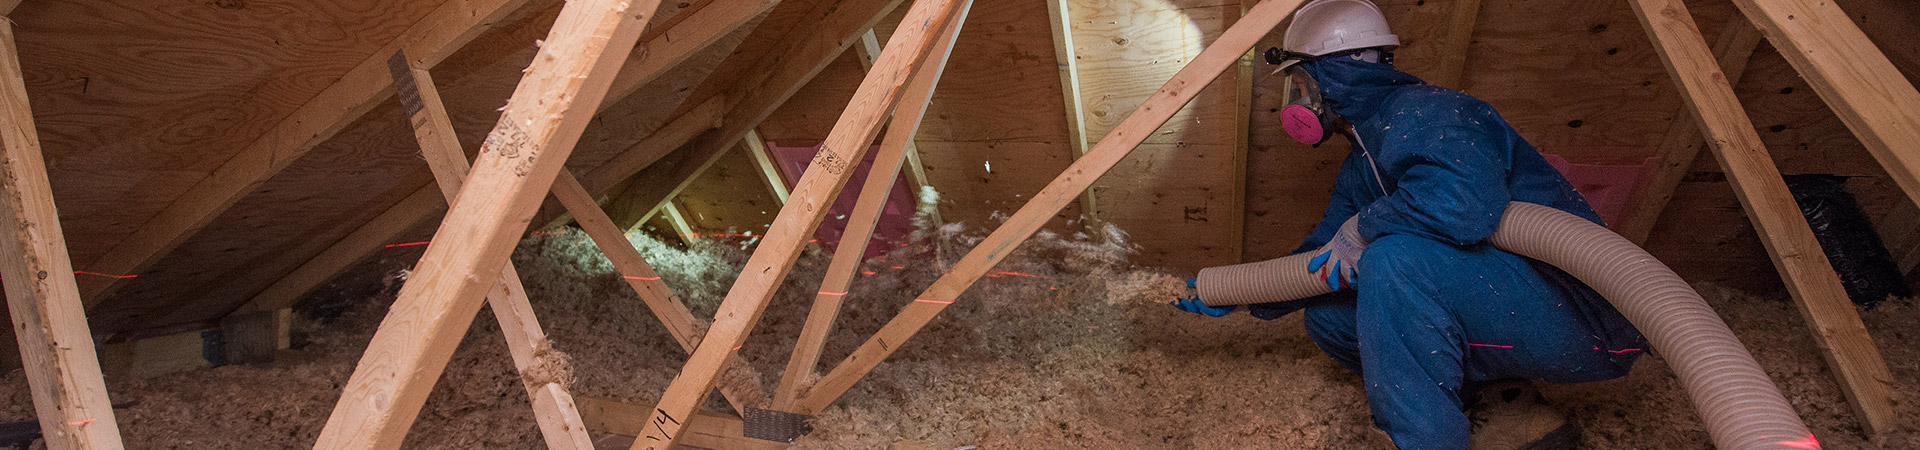 Residential attic insulation burlington hamilton for Foundation blanket wrap insulation